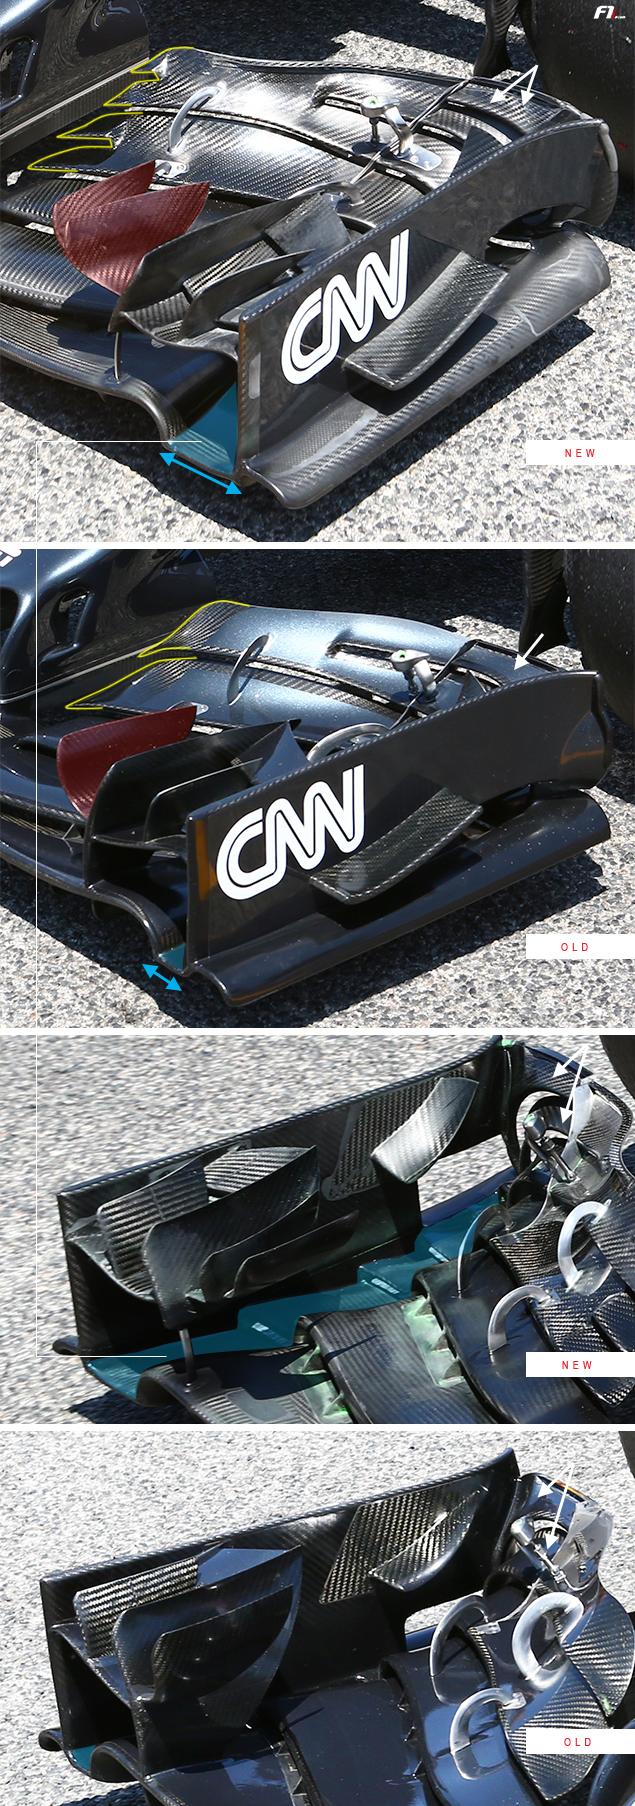 F1_technical-mclaren-front-wing